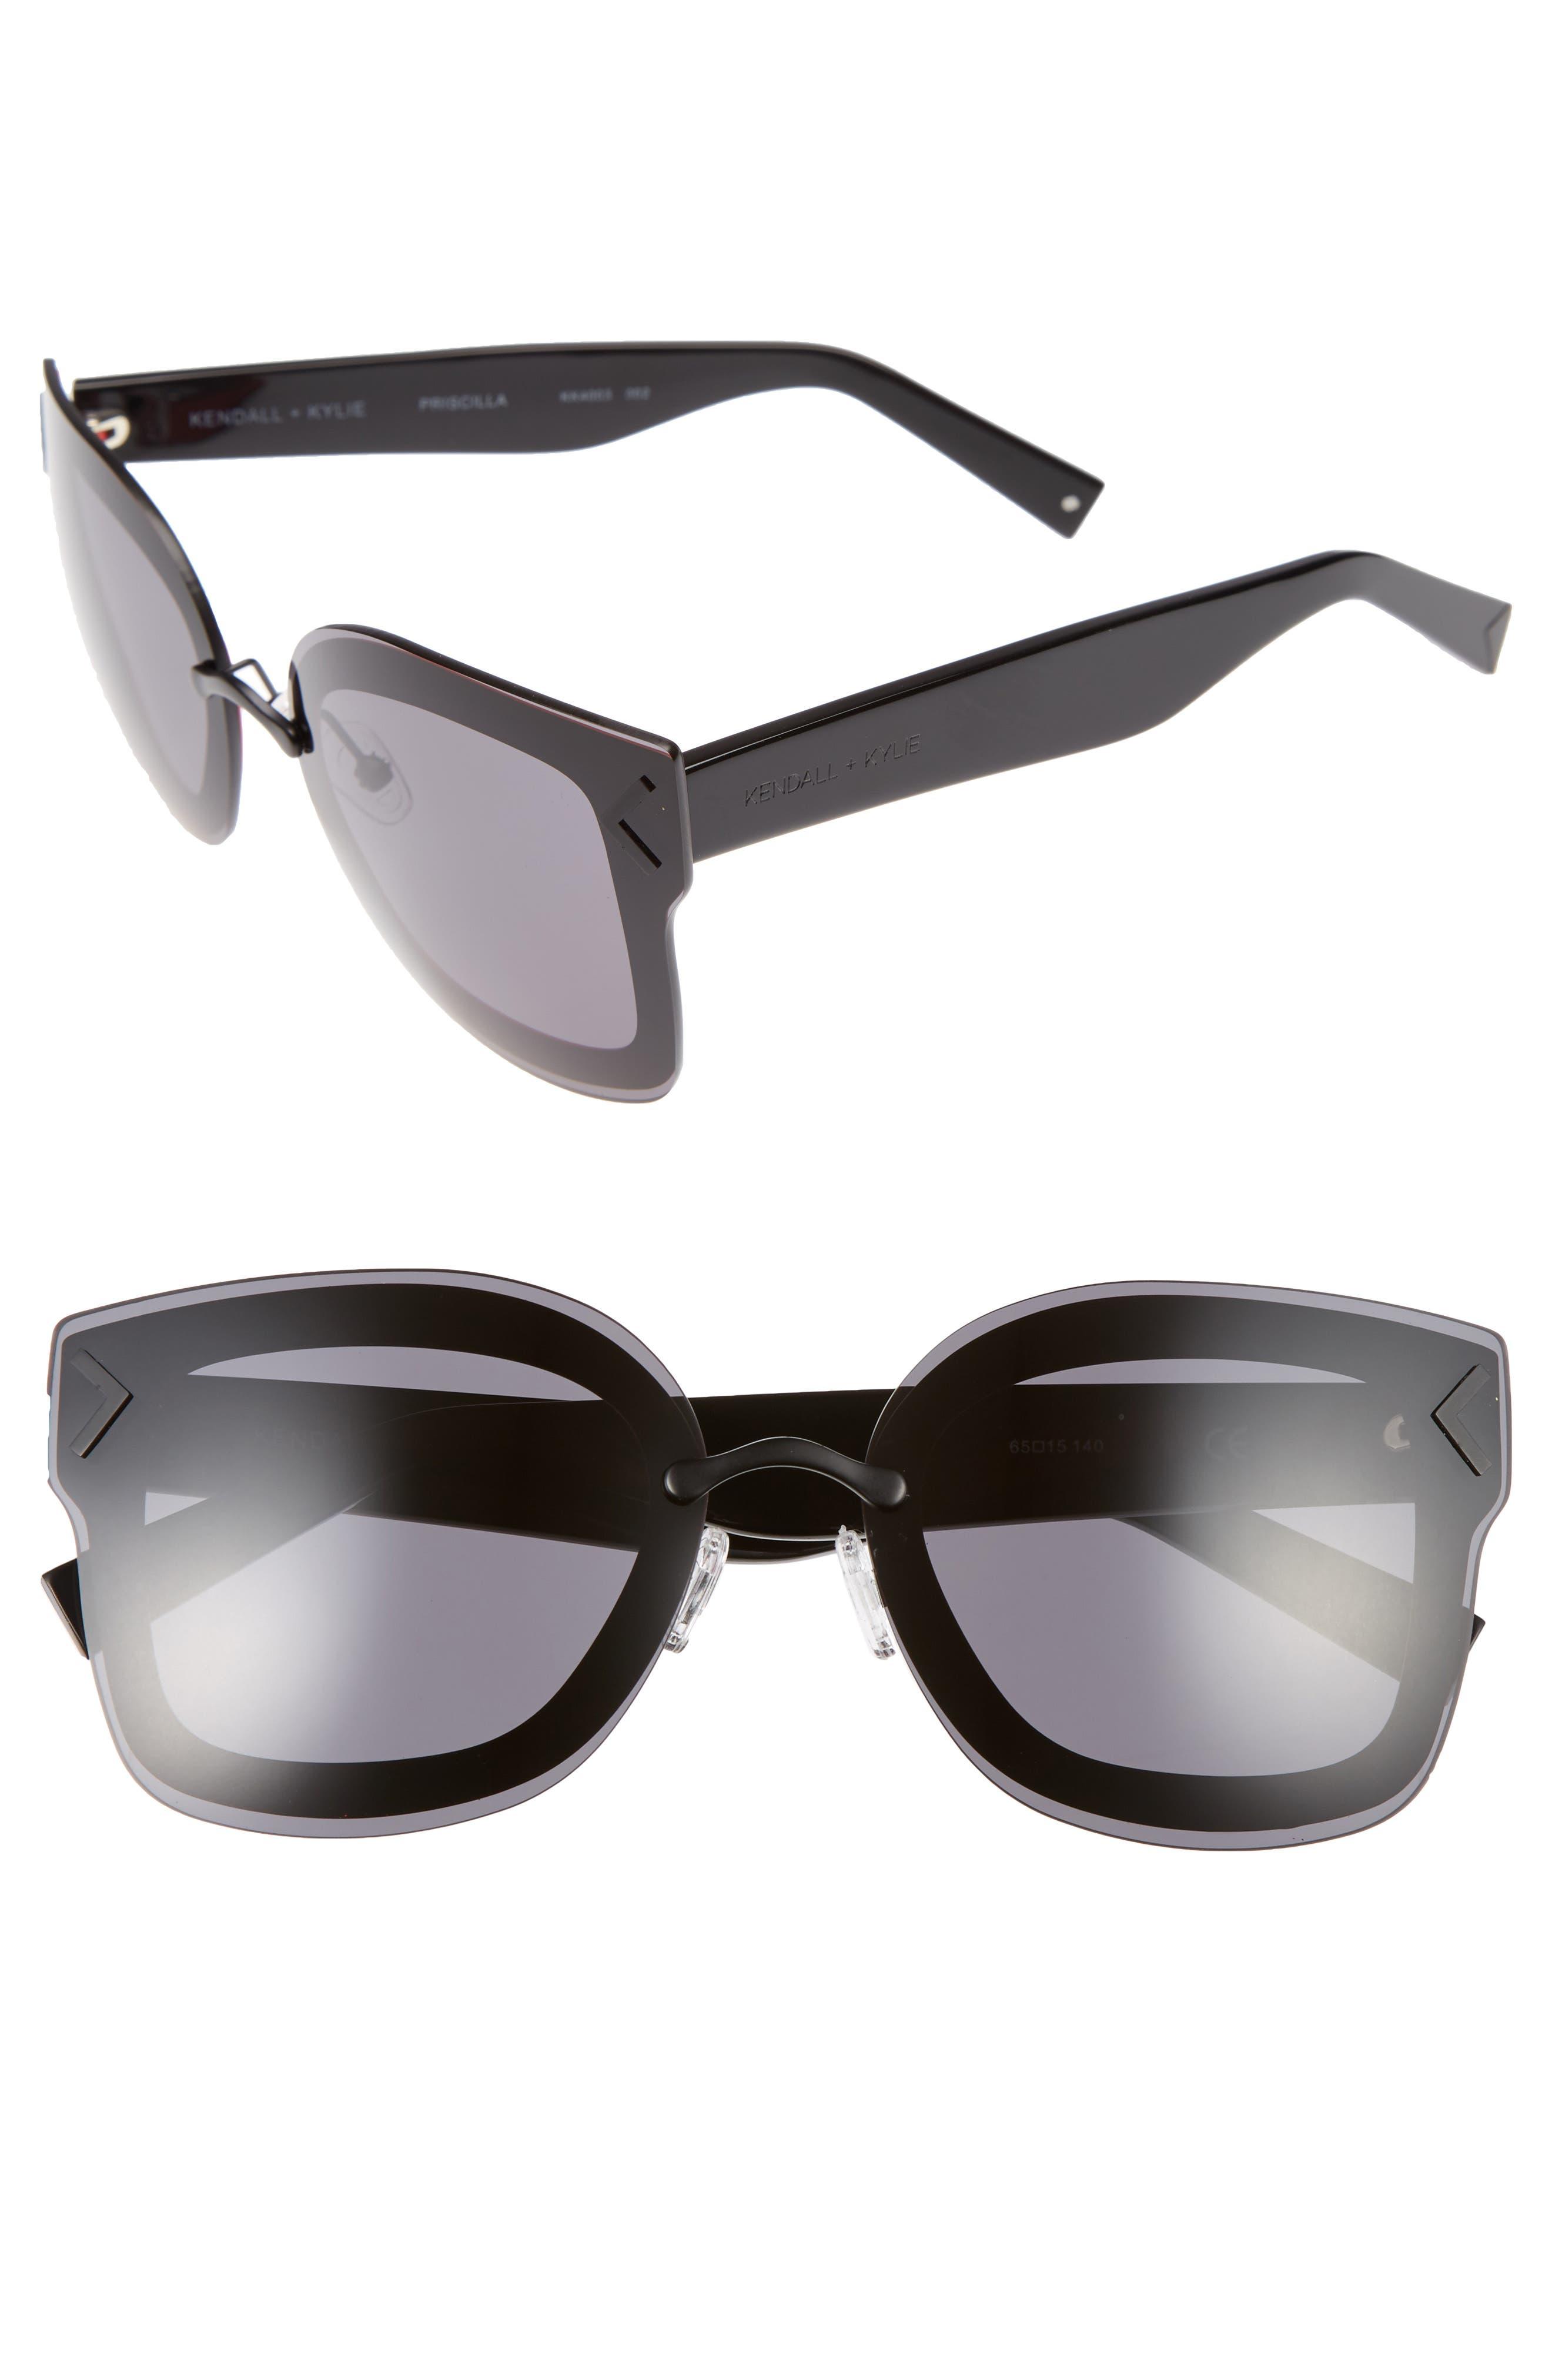 Priscilla 65mm Butterfly Sunglasses,                             Main thumbnail 1, color,                             001